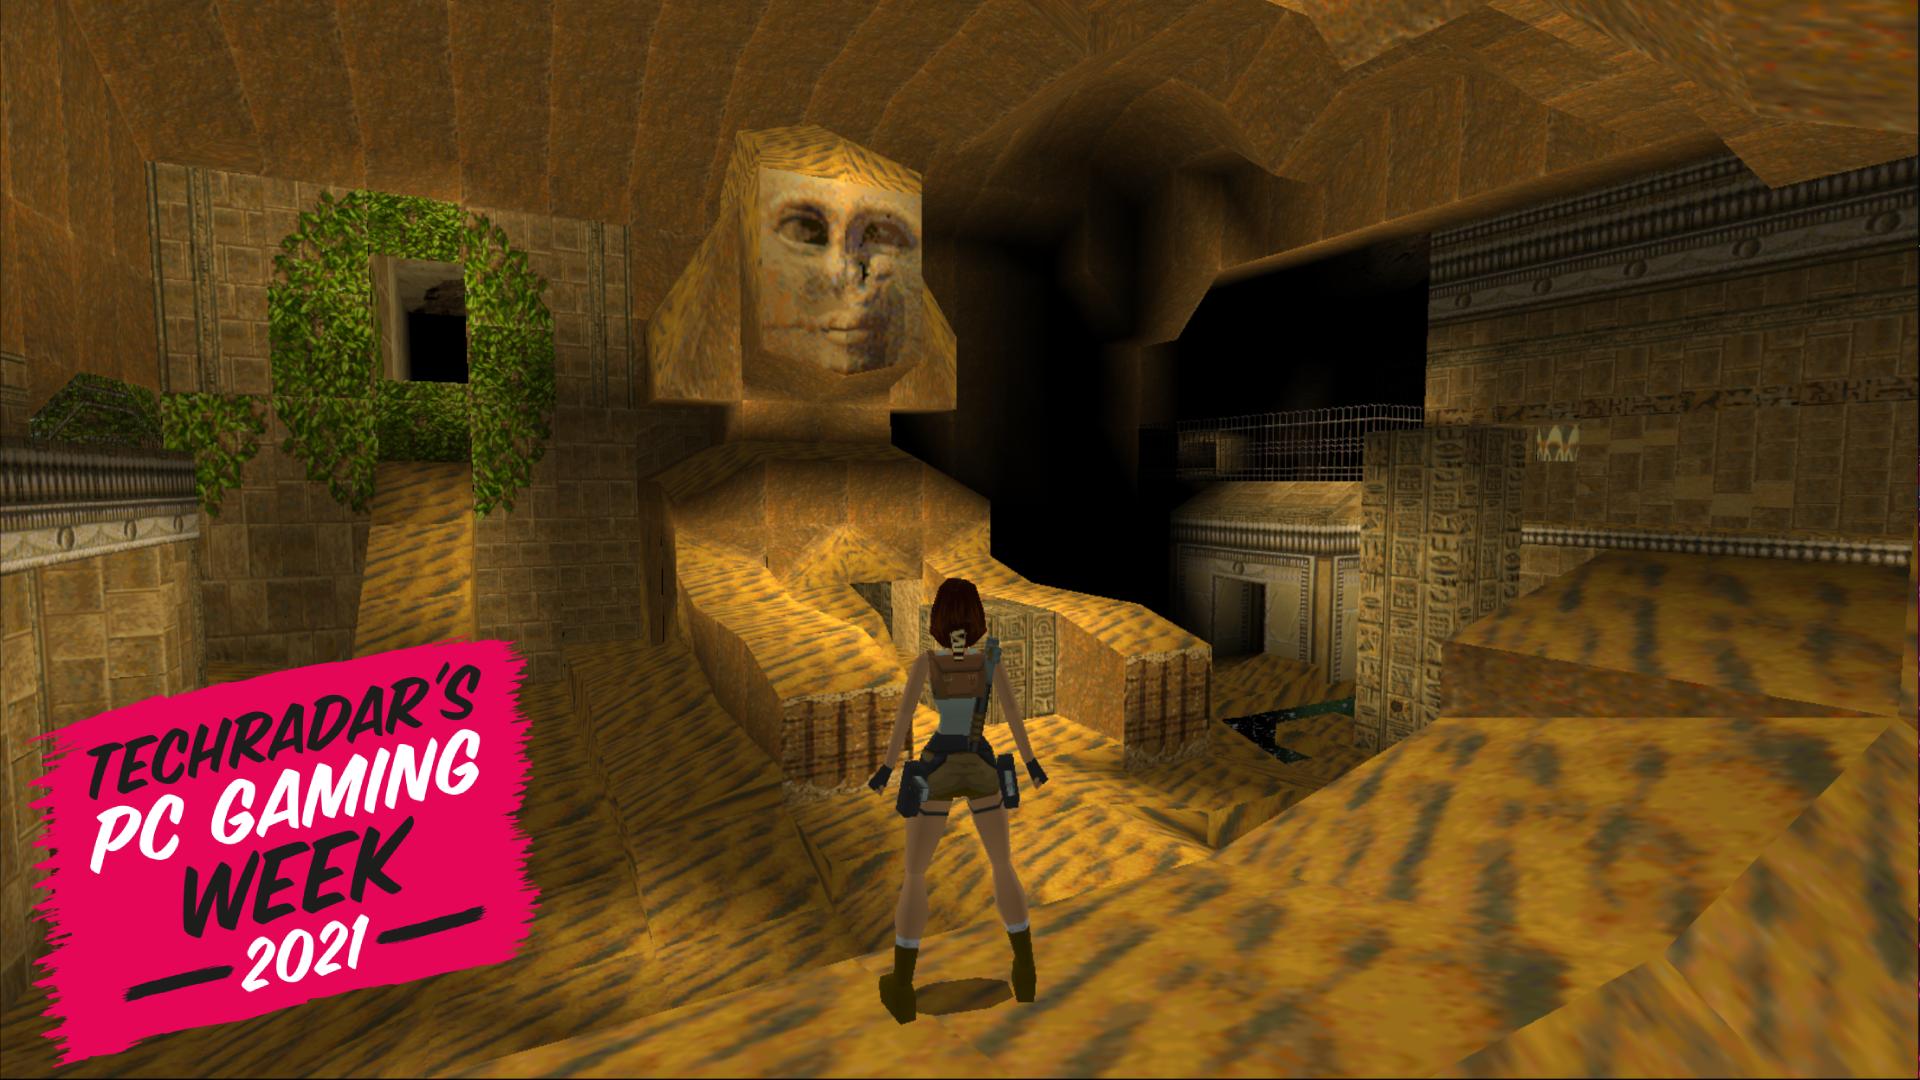 Lara Croft in Egypt, in the original Tomb Raider game